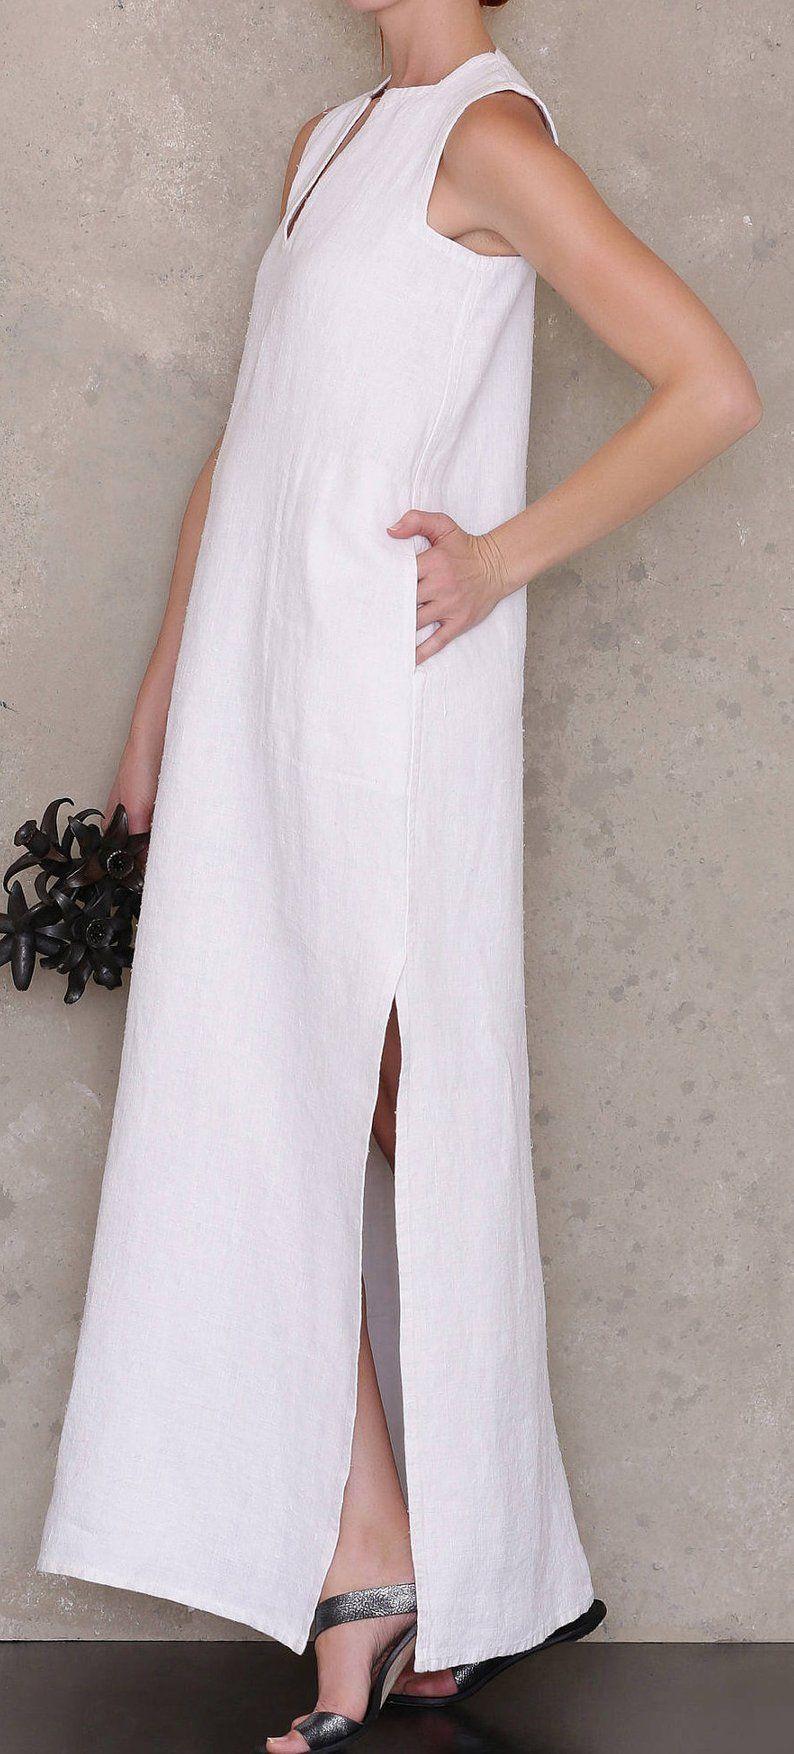 Caftan maxi dress summer linen dress pattern, PDF sewing